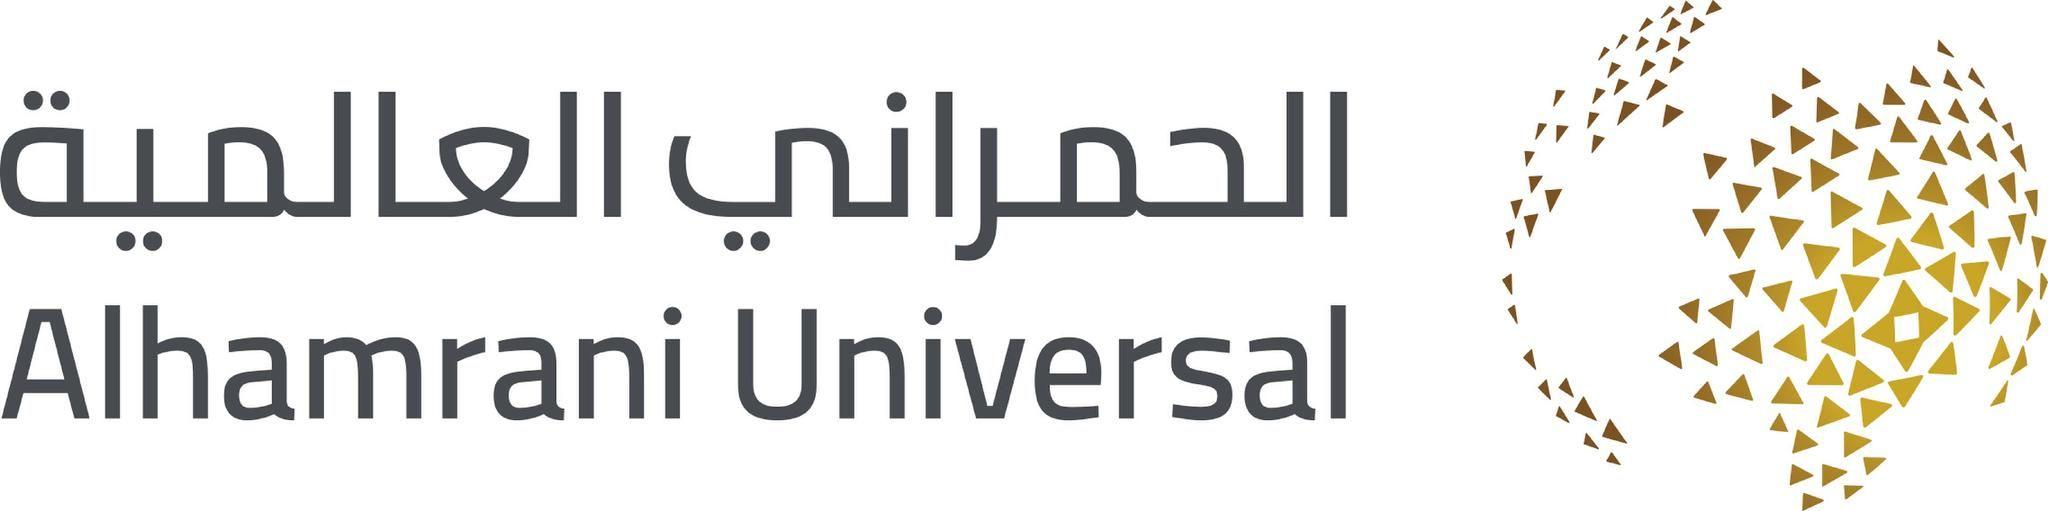 Alhamrani Universal Ateon